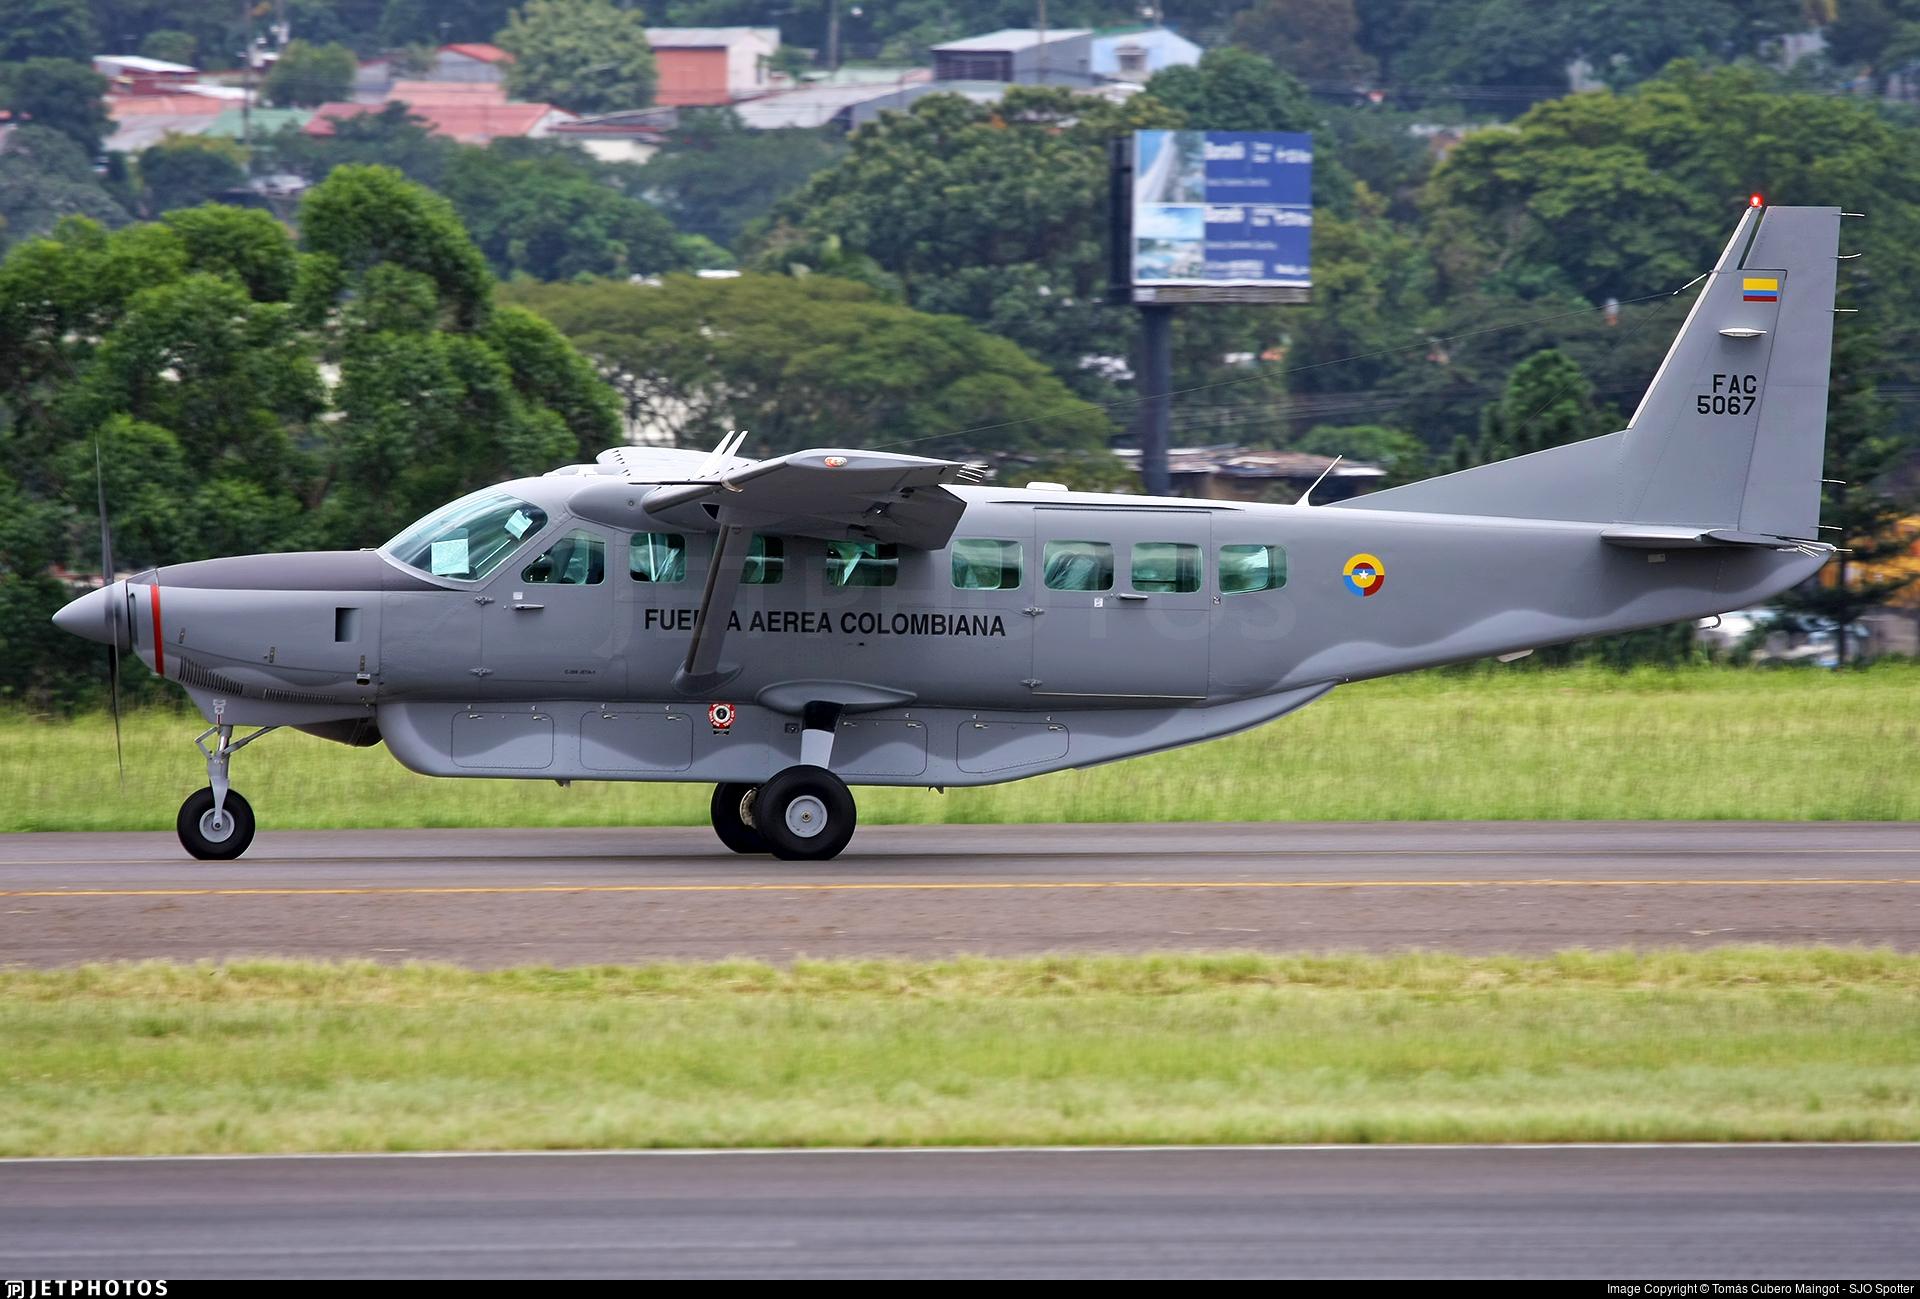 FAC5067 - Cessna 208B Grand Caravan - Colombia - Air Force